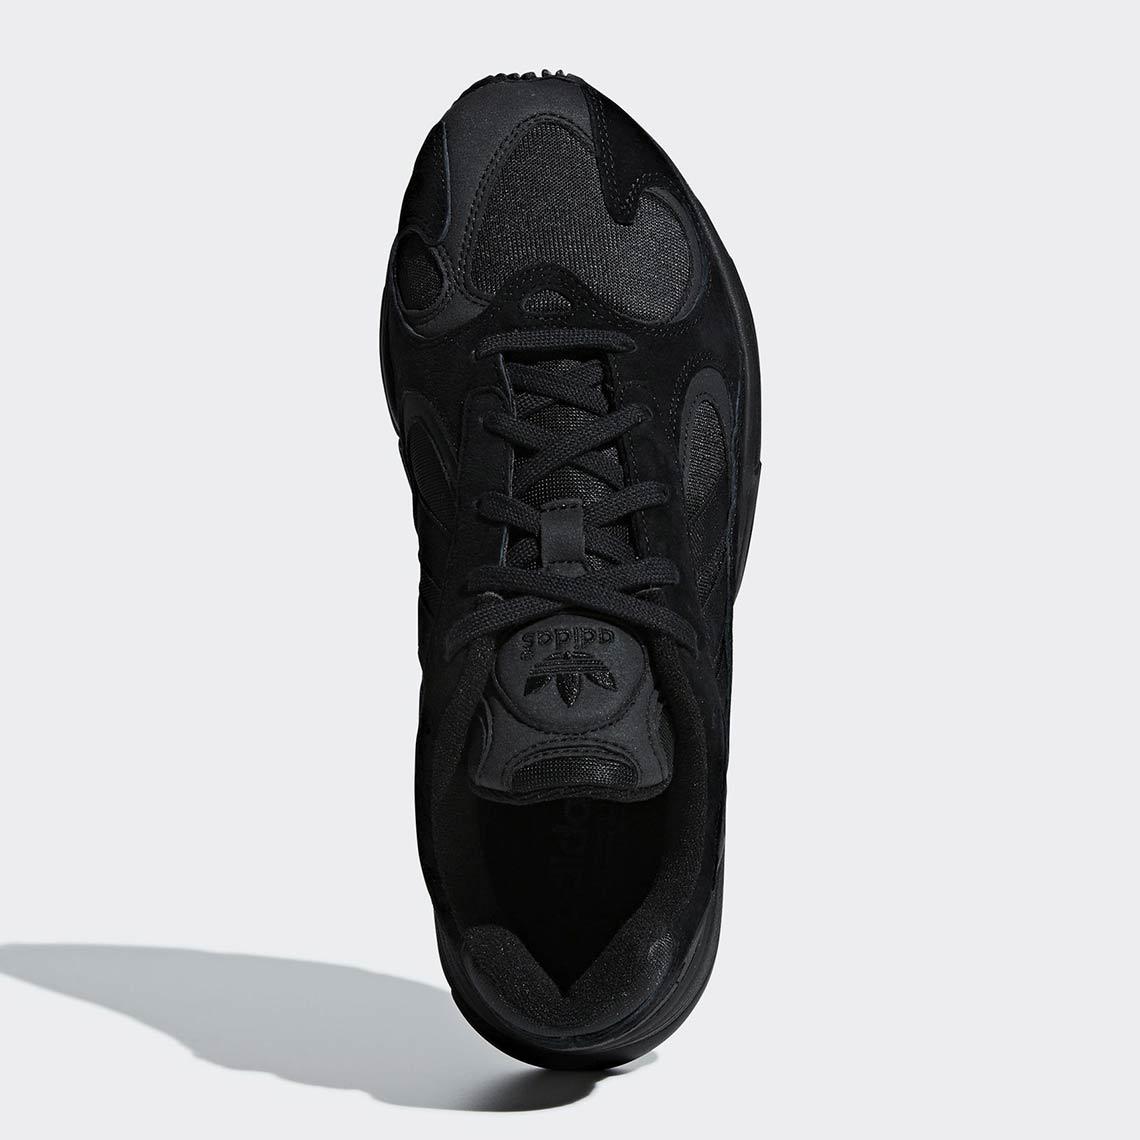 new arrivals cefcd 00383 adidas Yung 1 Black  G27026